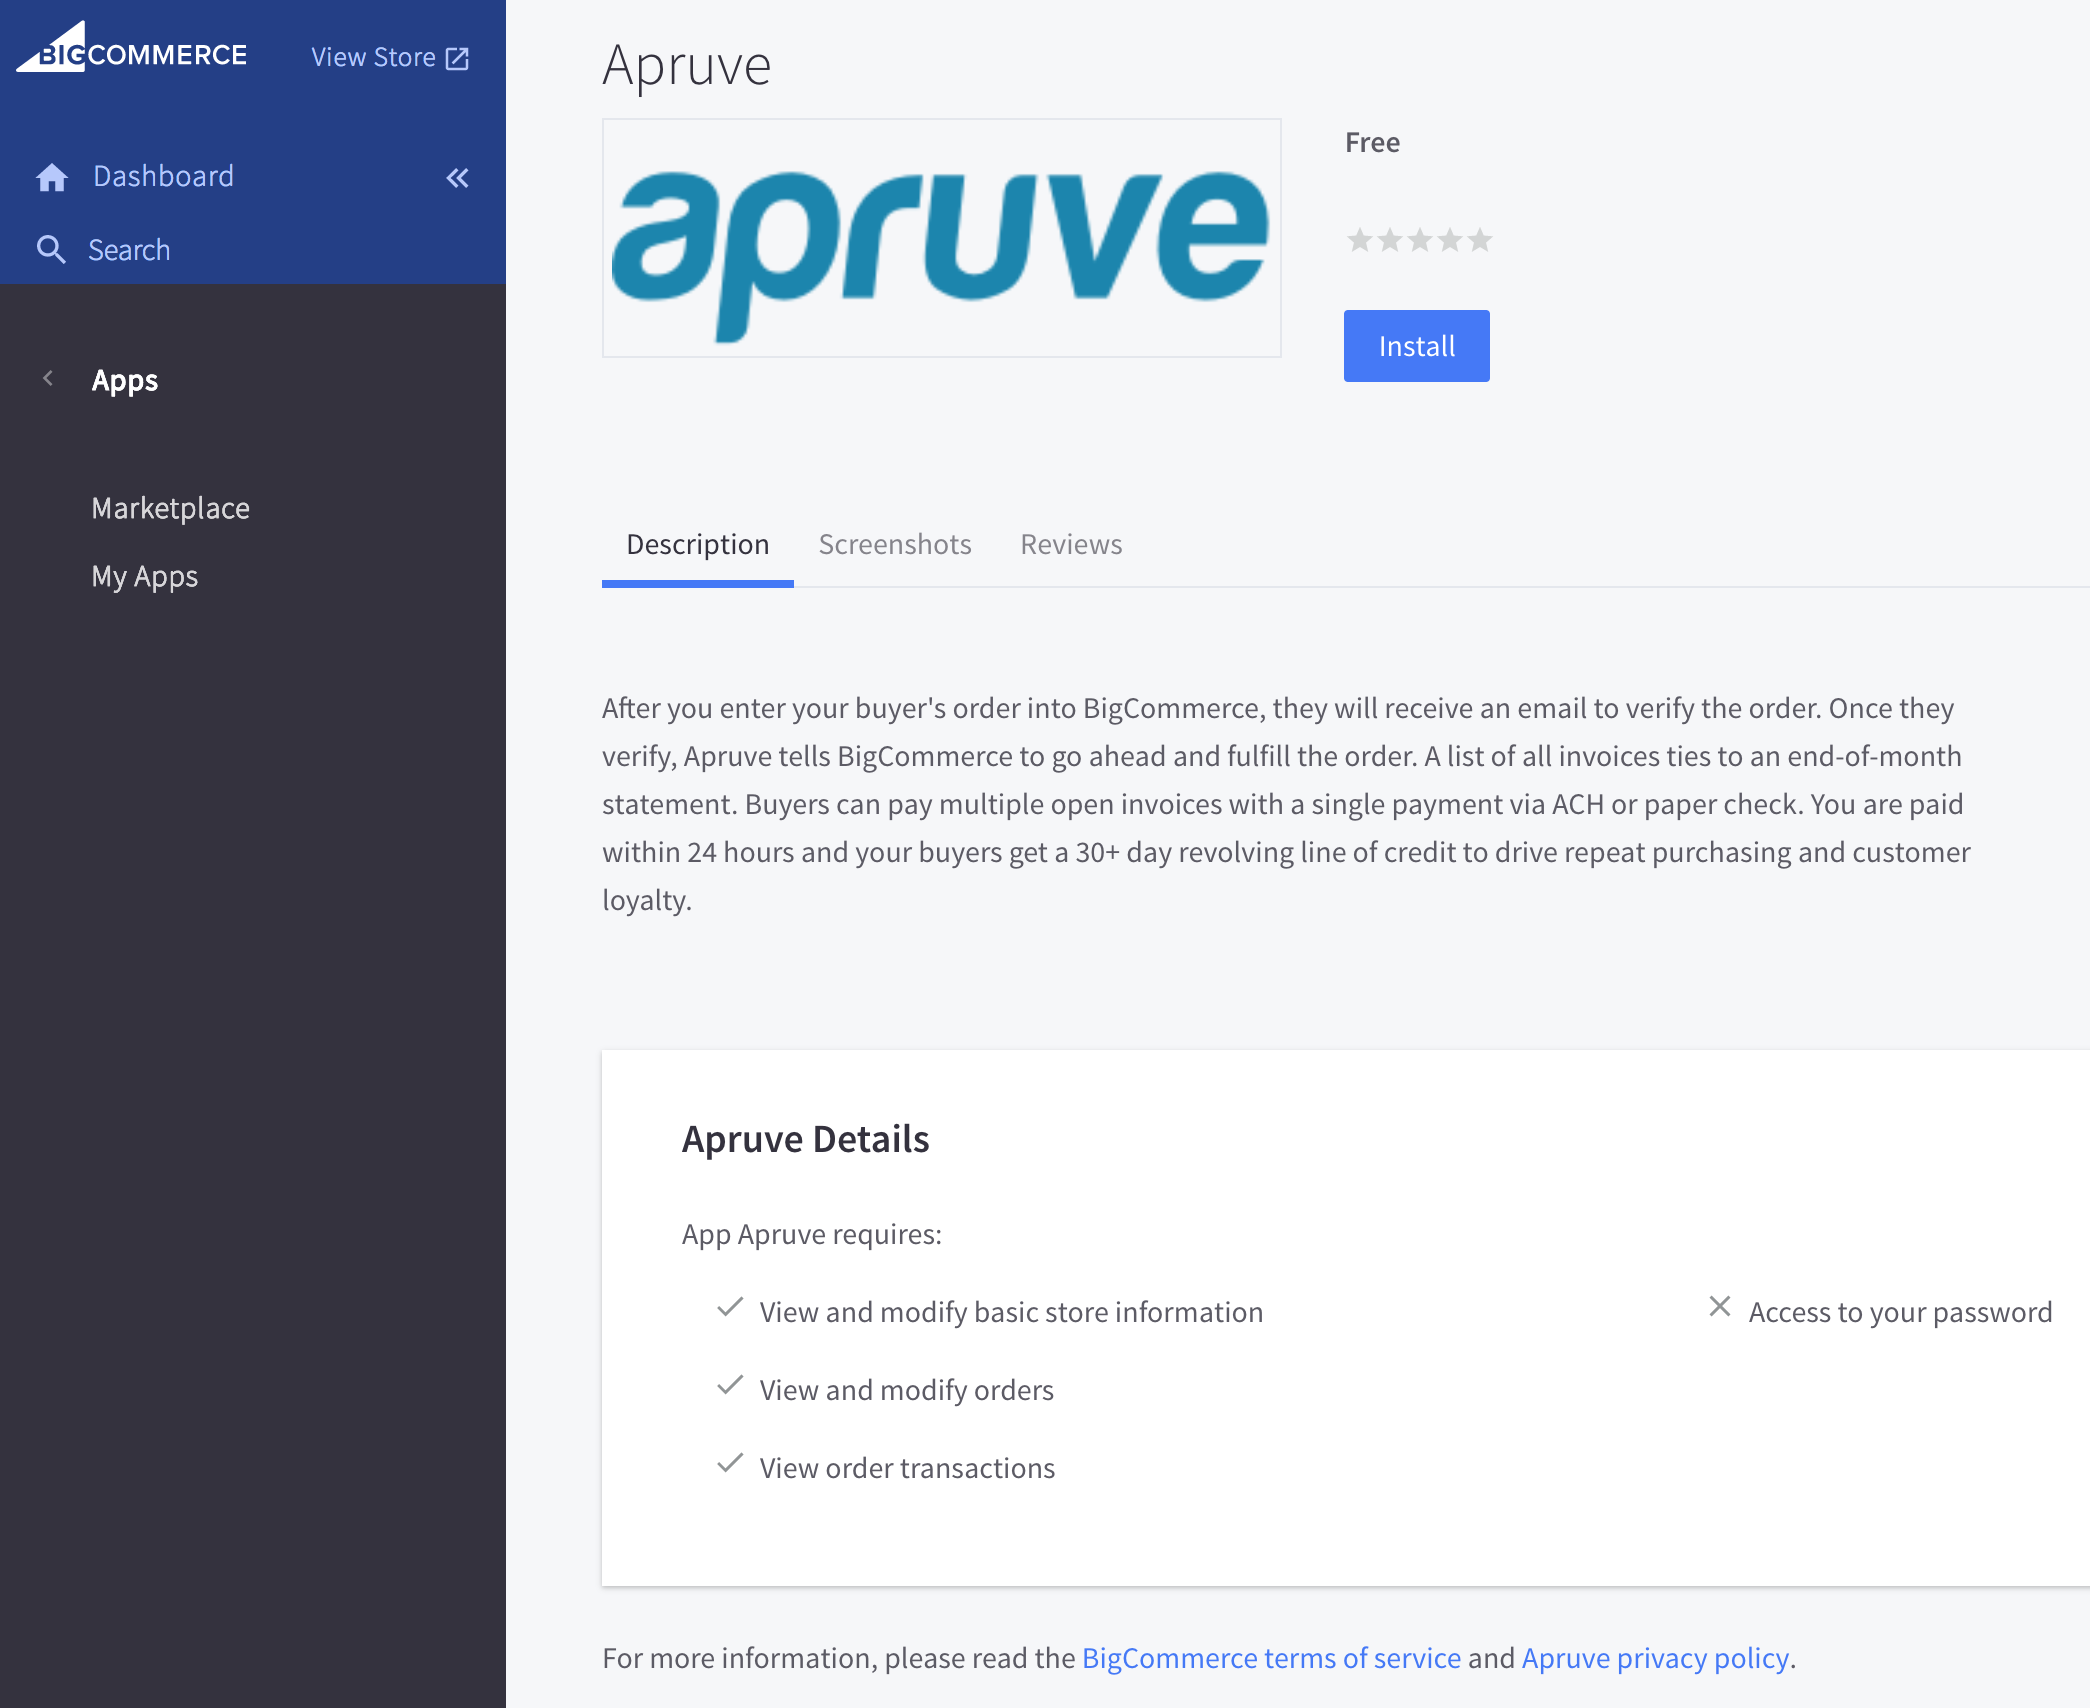 Installing Apruve